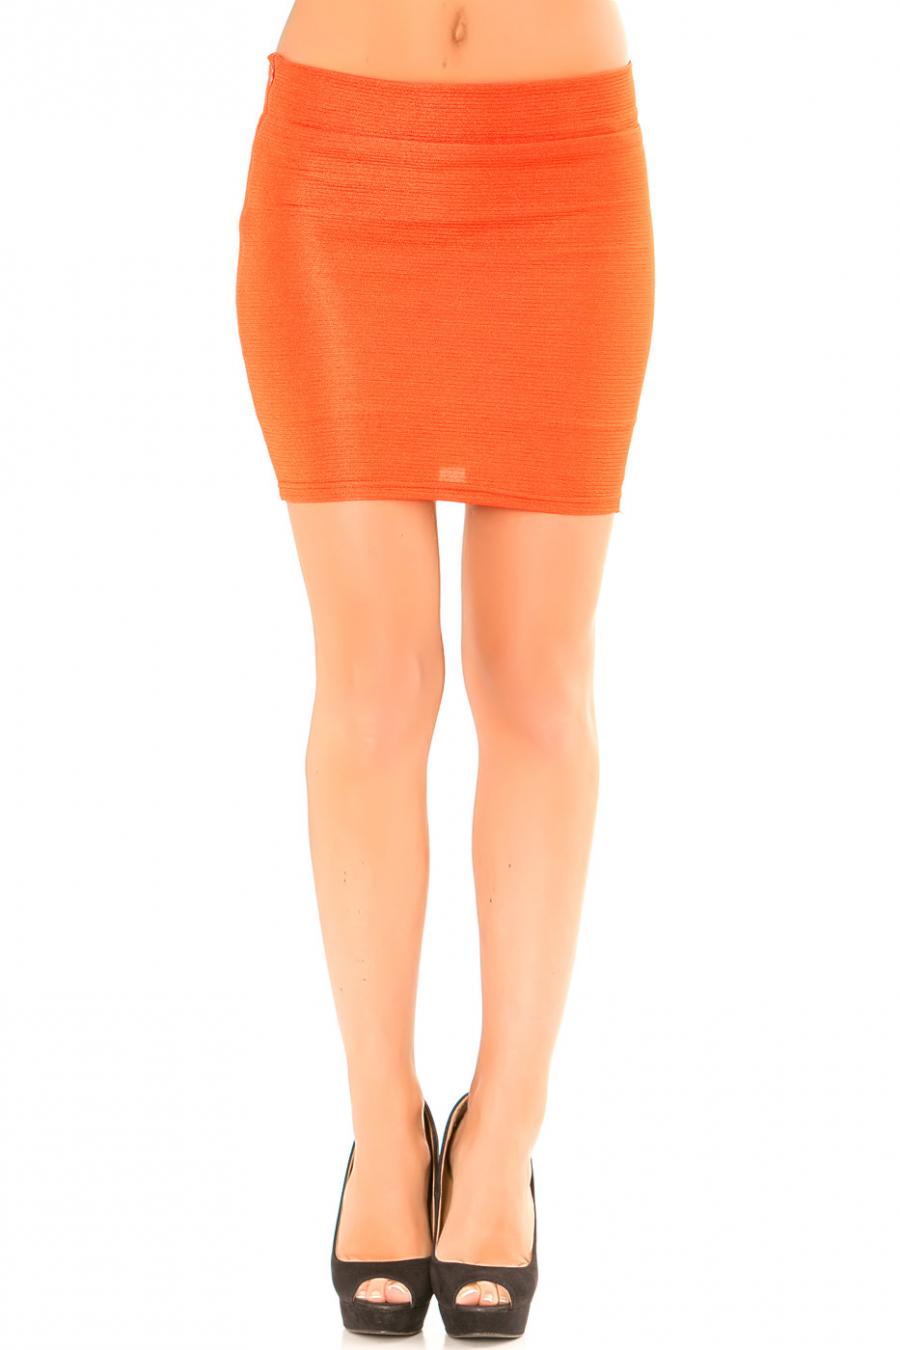 Mini jupe Orange côtelé. Jupe effet brillant. 1006